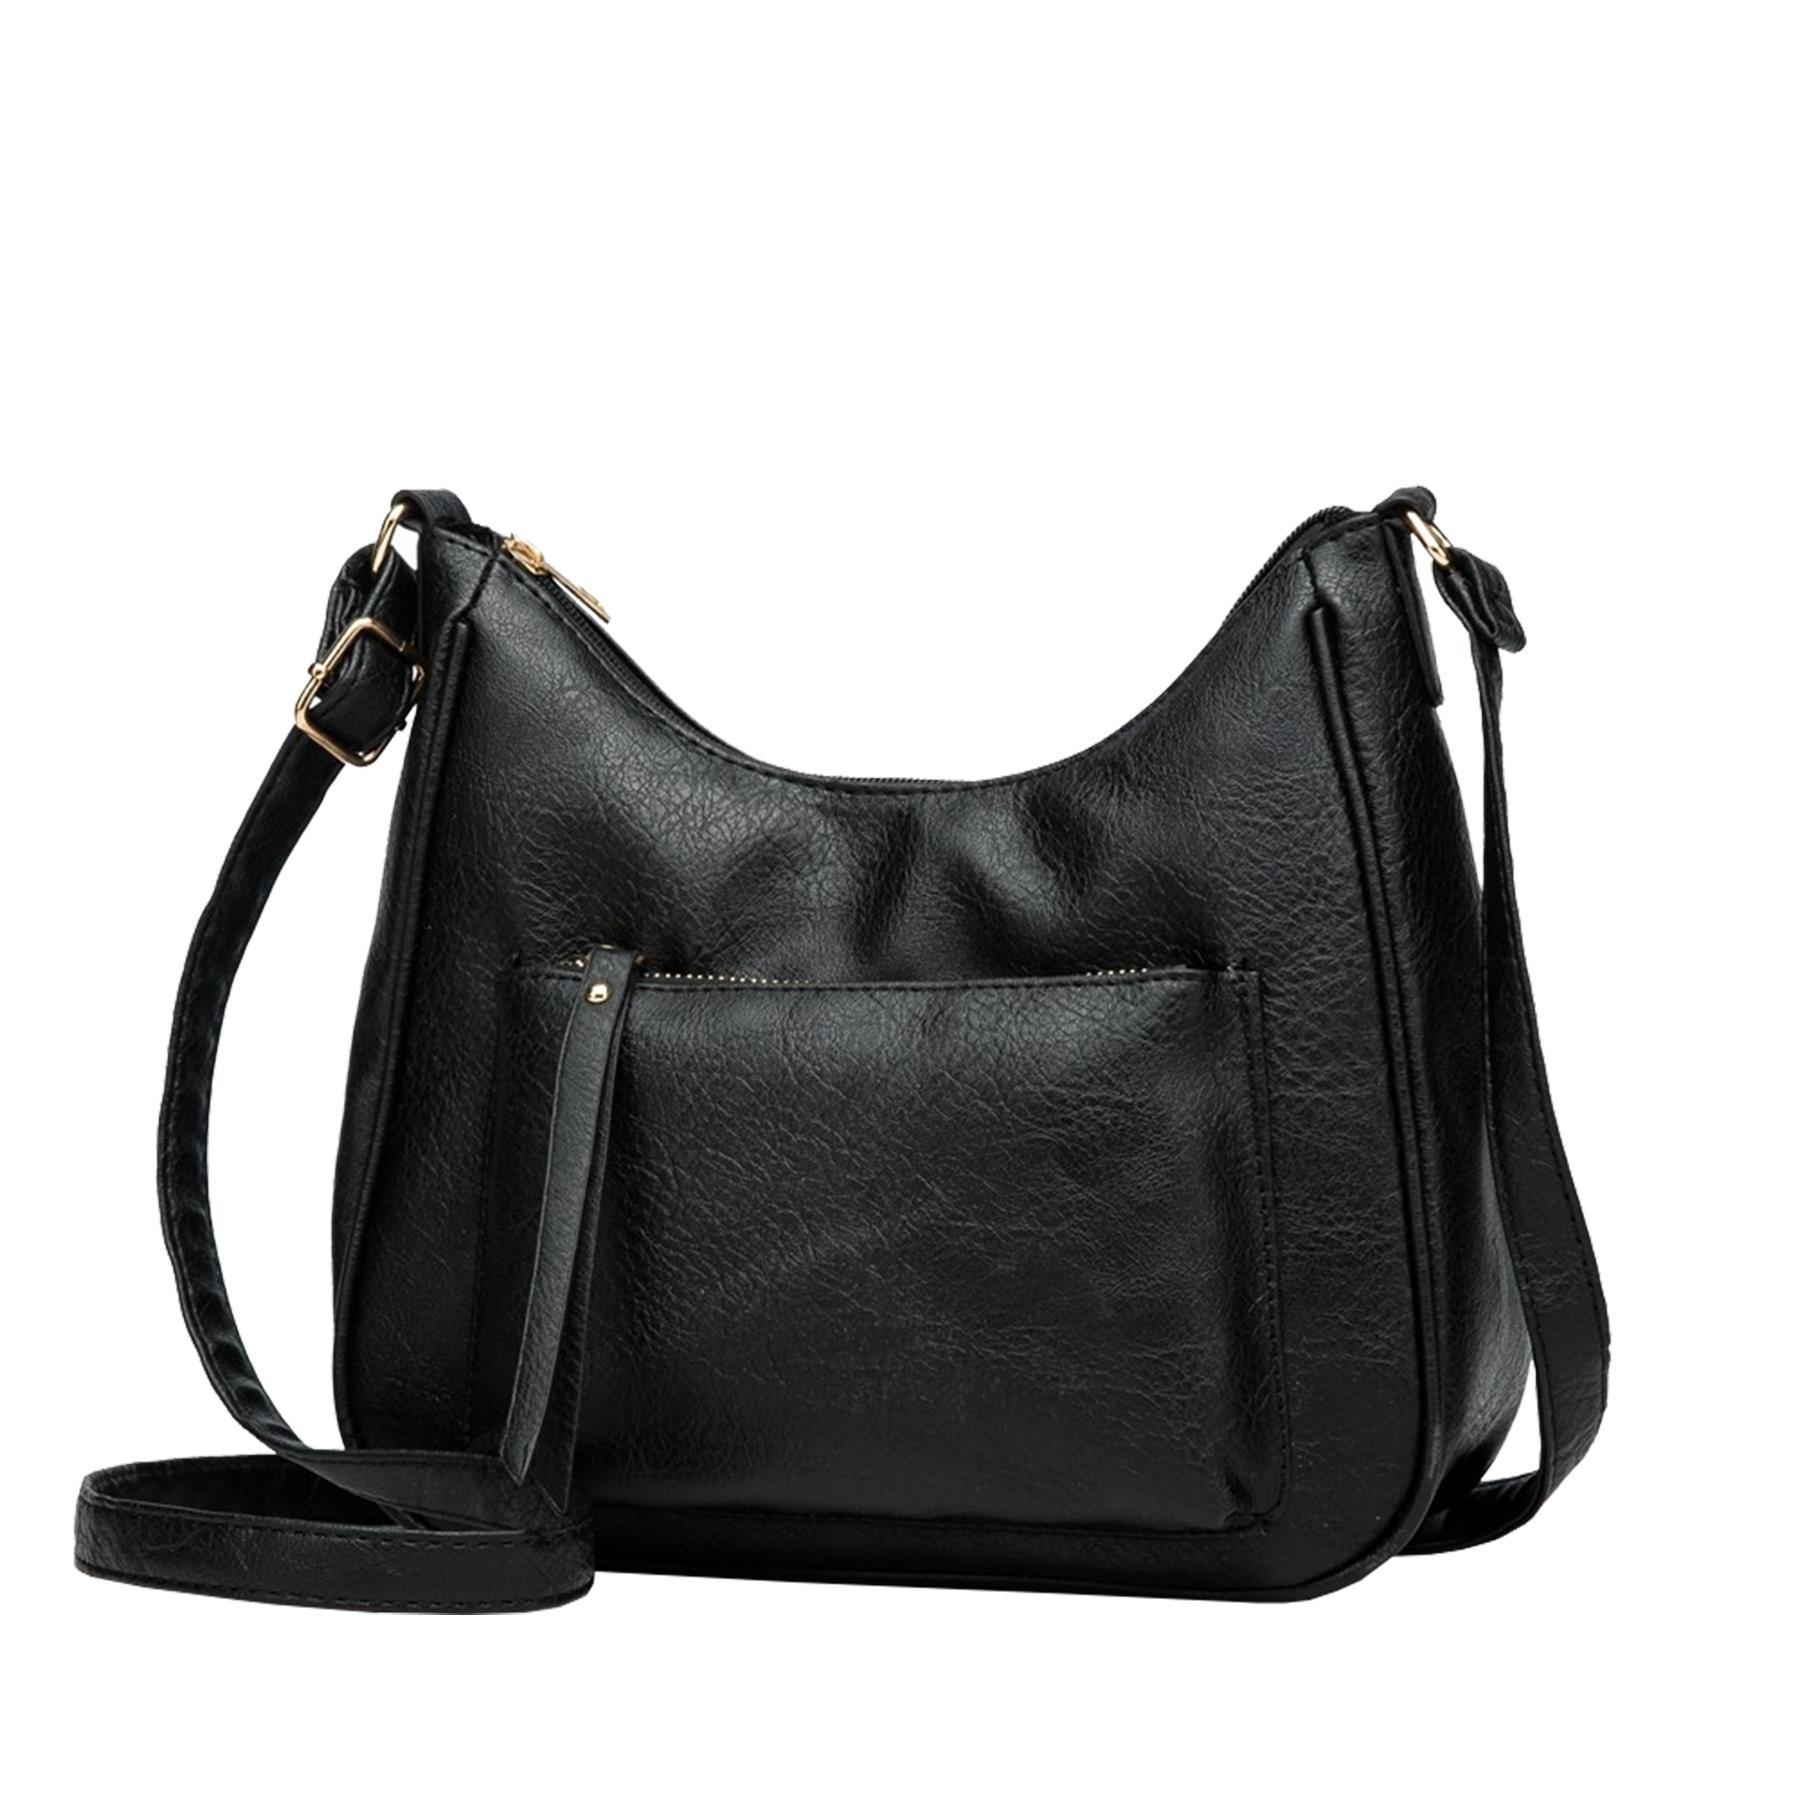 New-Soft-Synthetic-Leather-Front-Pocket-Ladies-Casual-Crossbody-Bag-Handbag thumbnail 6